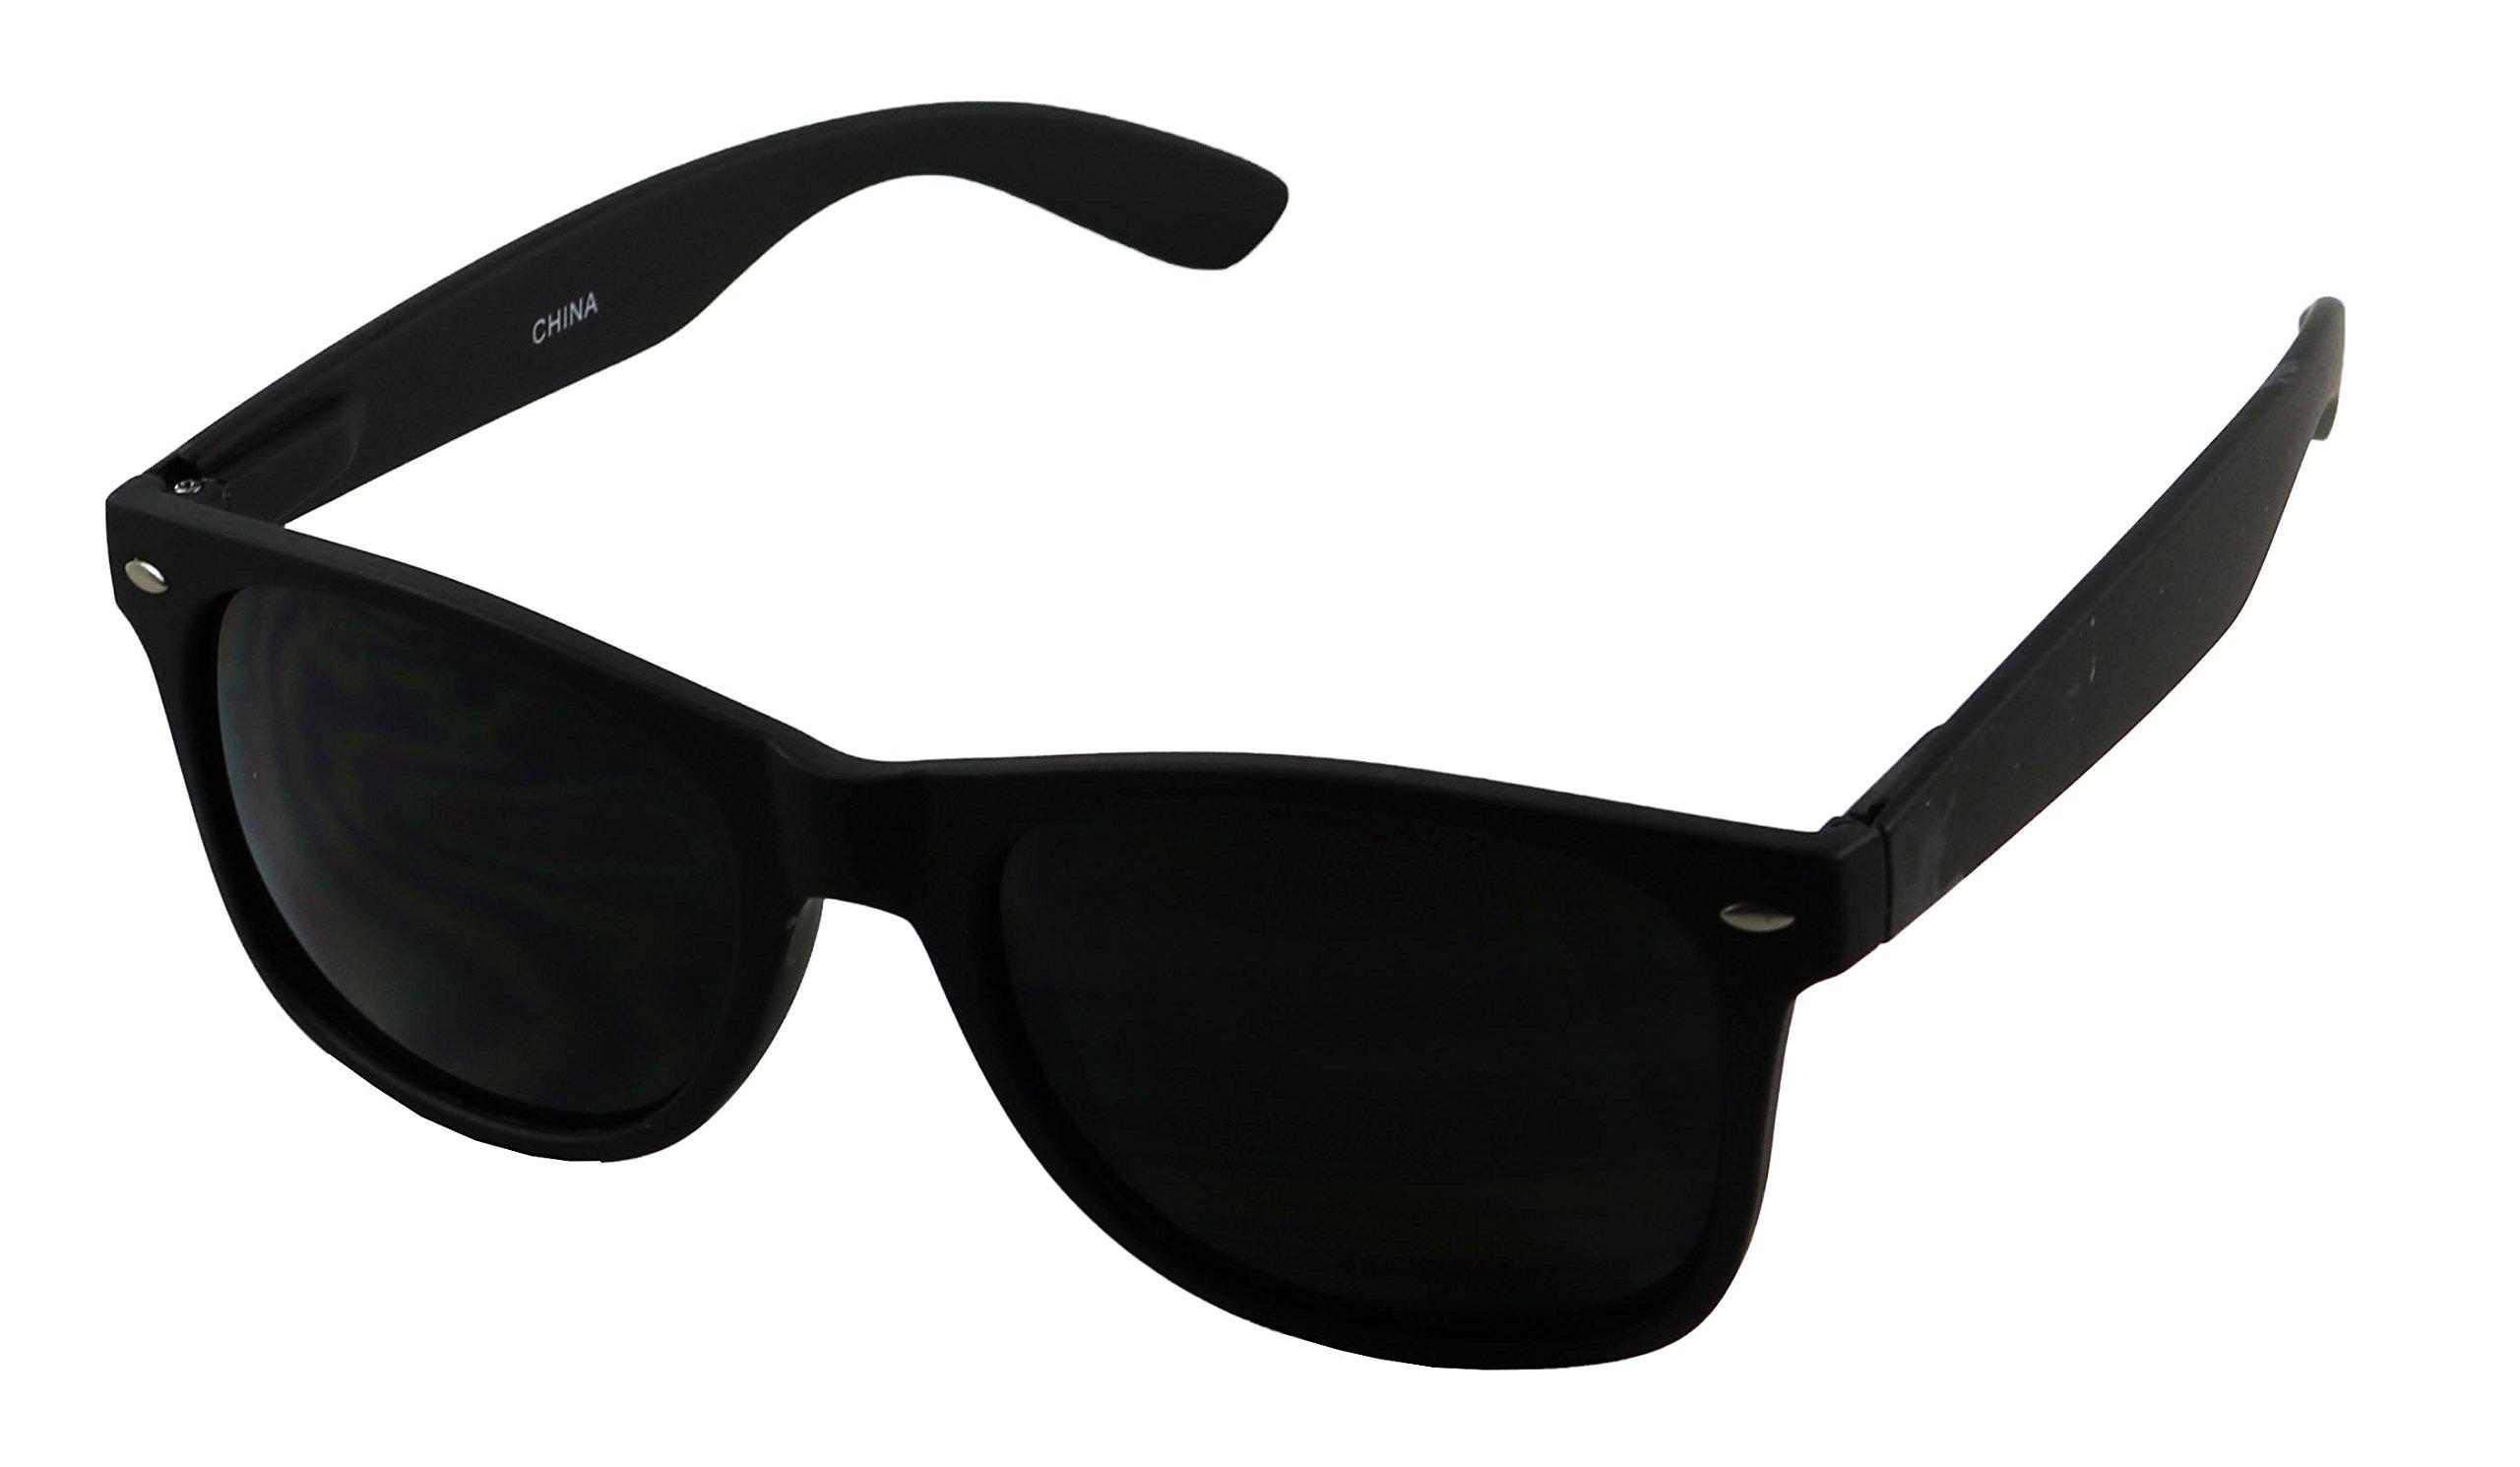 ShadyVEU - Super Dark Black Lens Round Springe Hinge Retro Soft Matte Mens Sunglasses by ShadyVEU